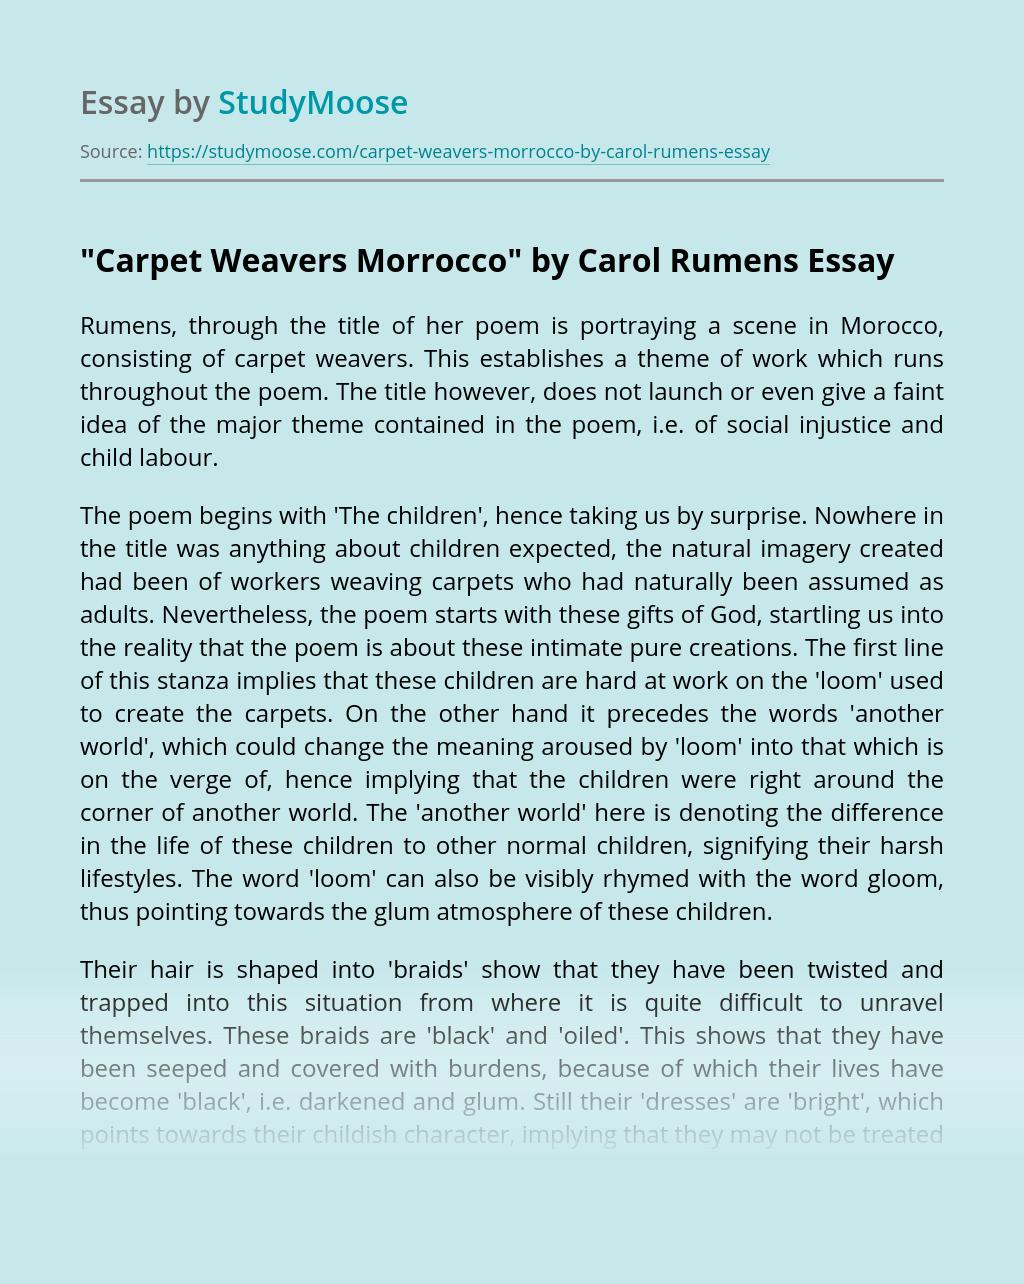 """Carpet Weavers Morrocco"" by Carol Rumens"